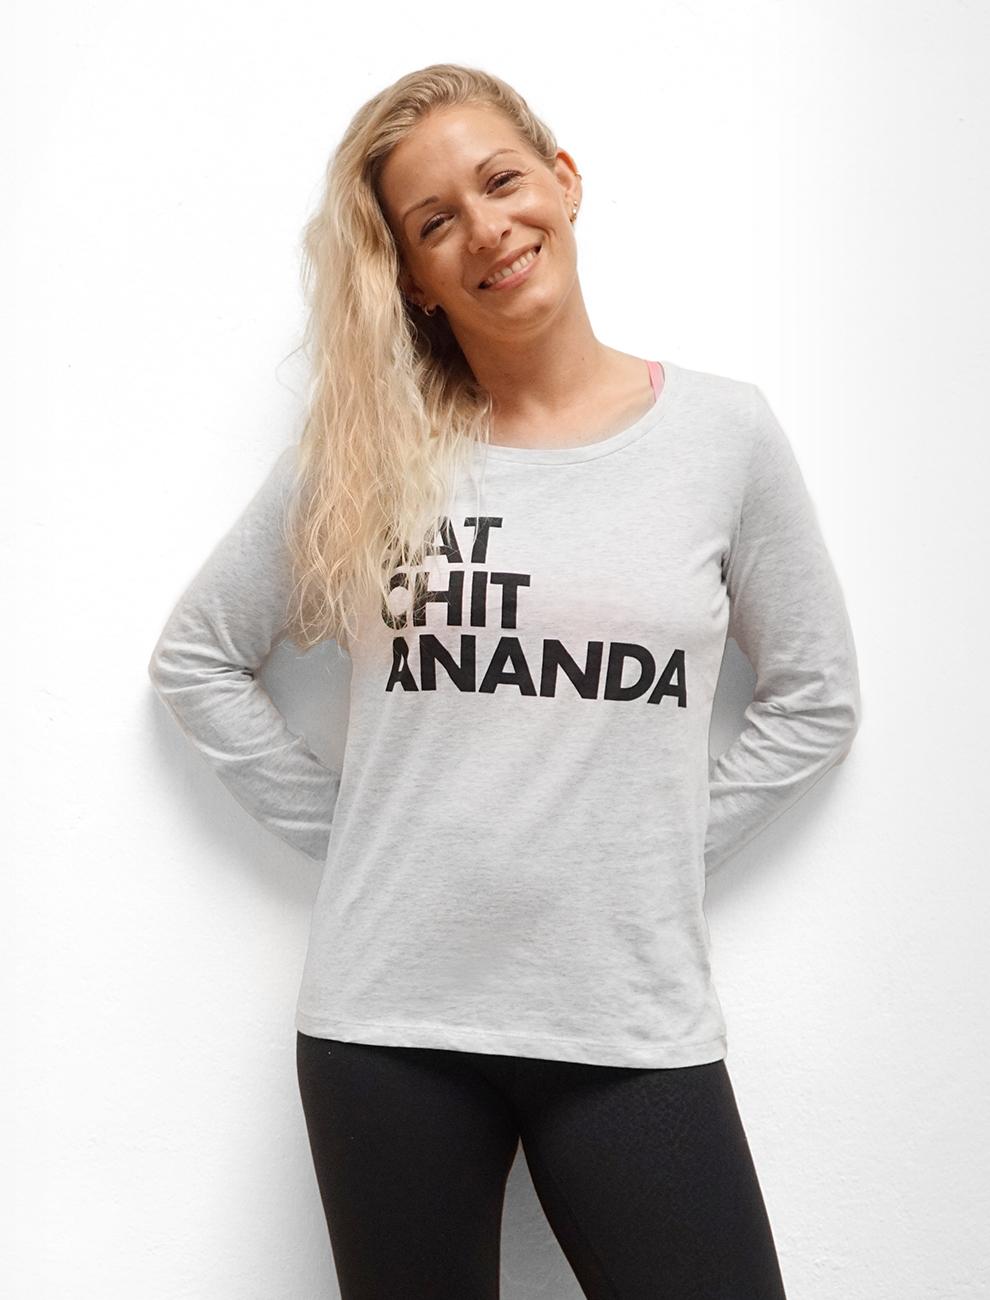 Sat Chit Ananda / Yoga Shirt Longsleeve / Nachhaltige Yoga Bekleidung / Neuzugang